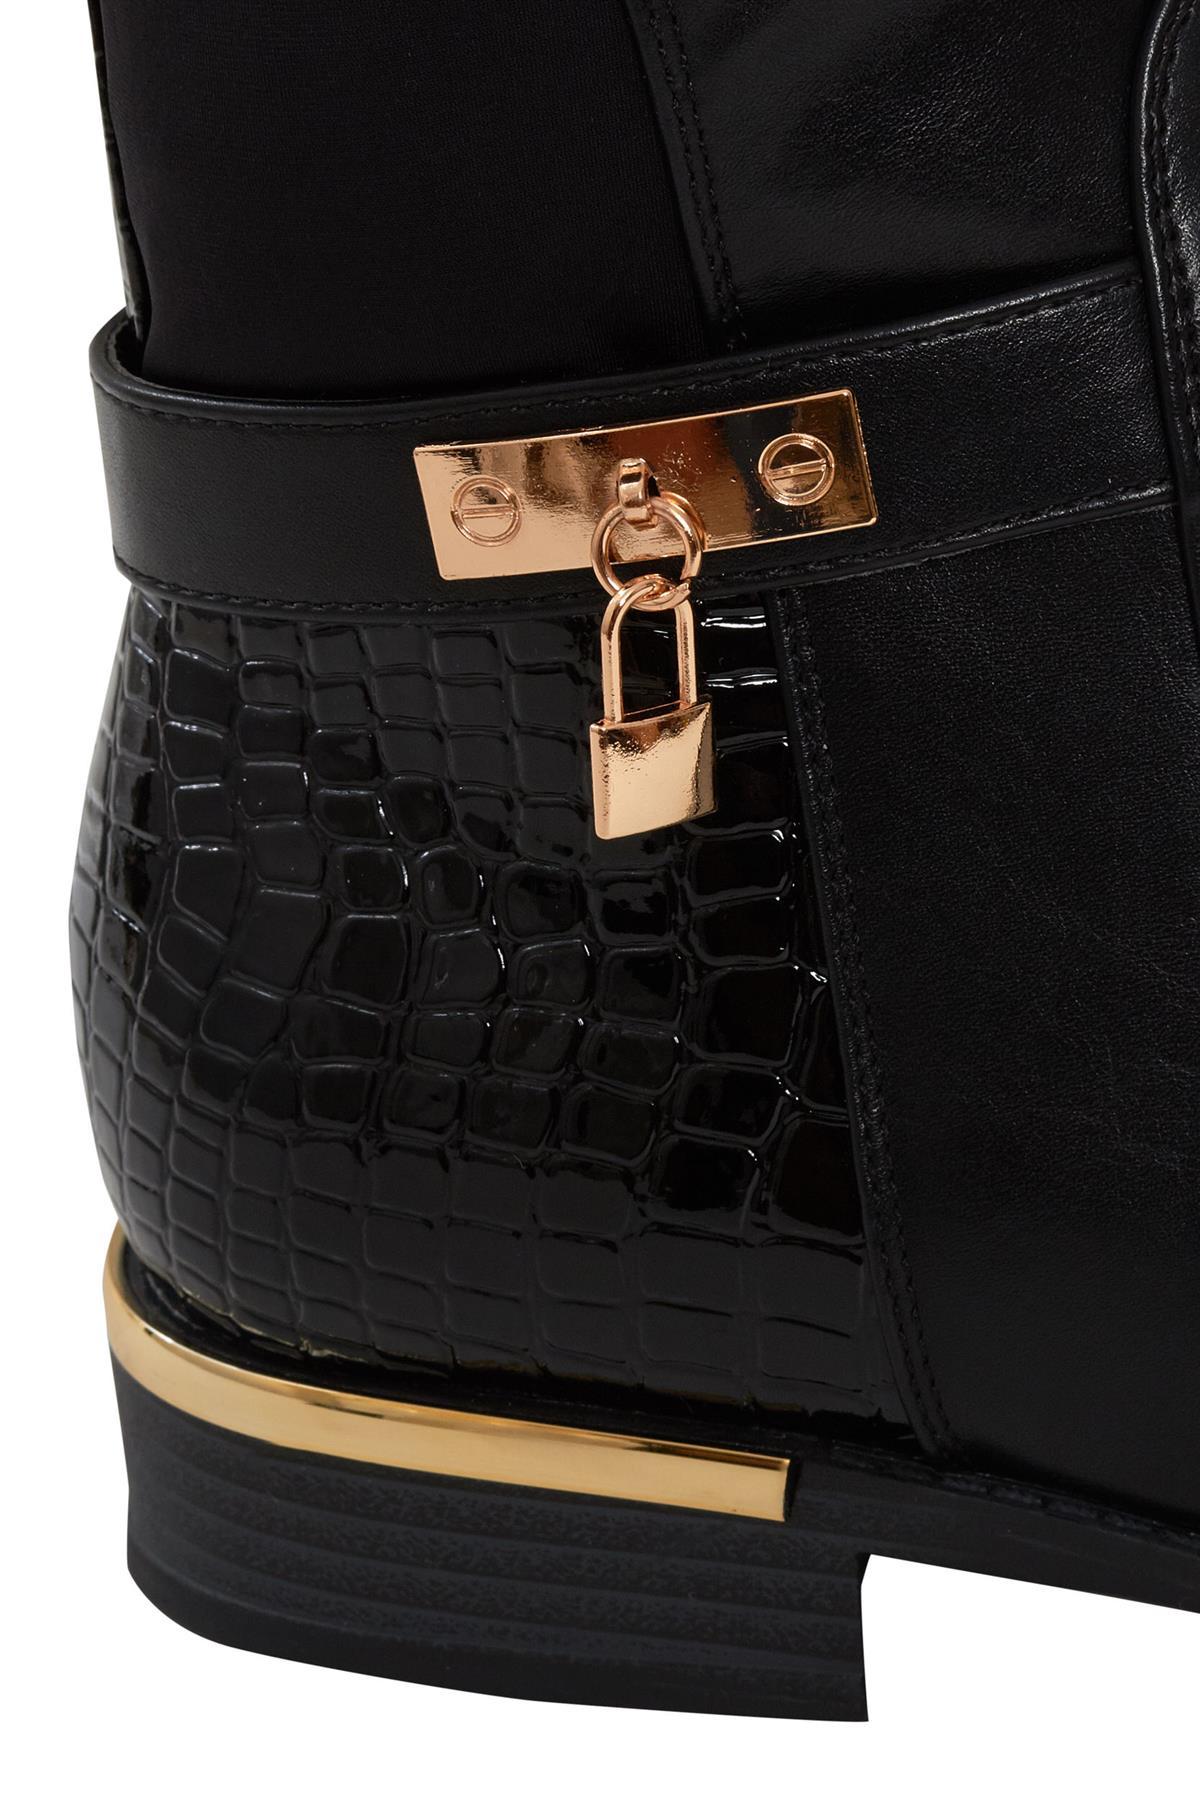 Womens-Ladies-Knee-High-Gold-Detail-Low-Block-Heel-Zip-Up-PU-Suede-Black-Boots thumbnail 4